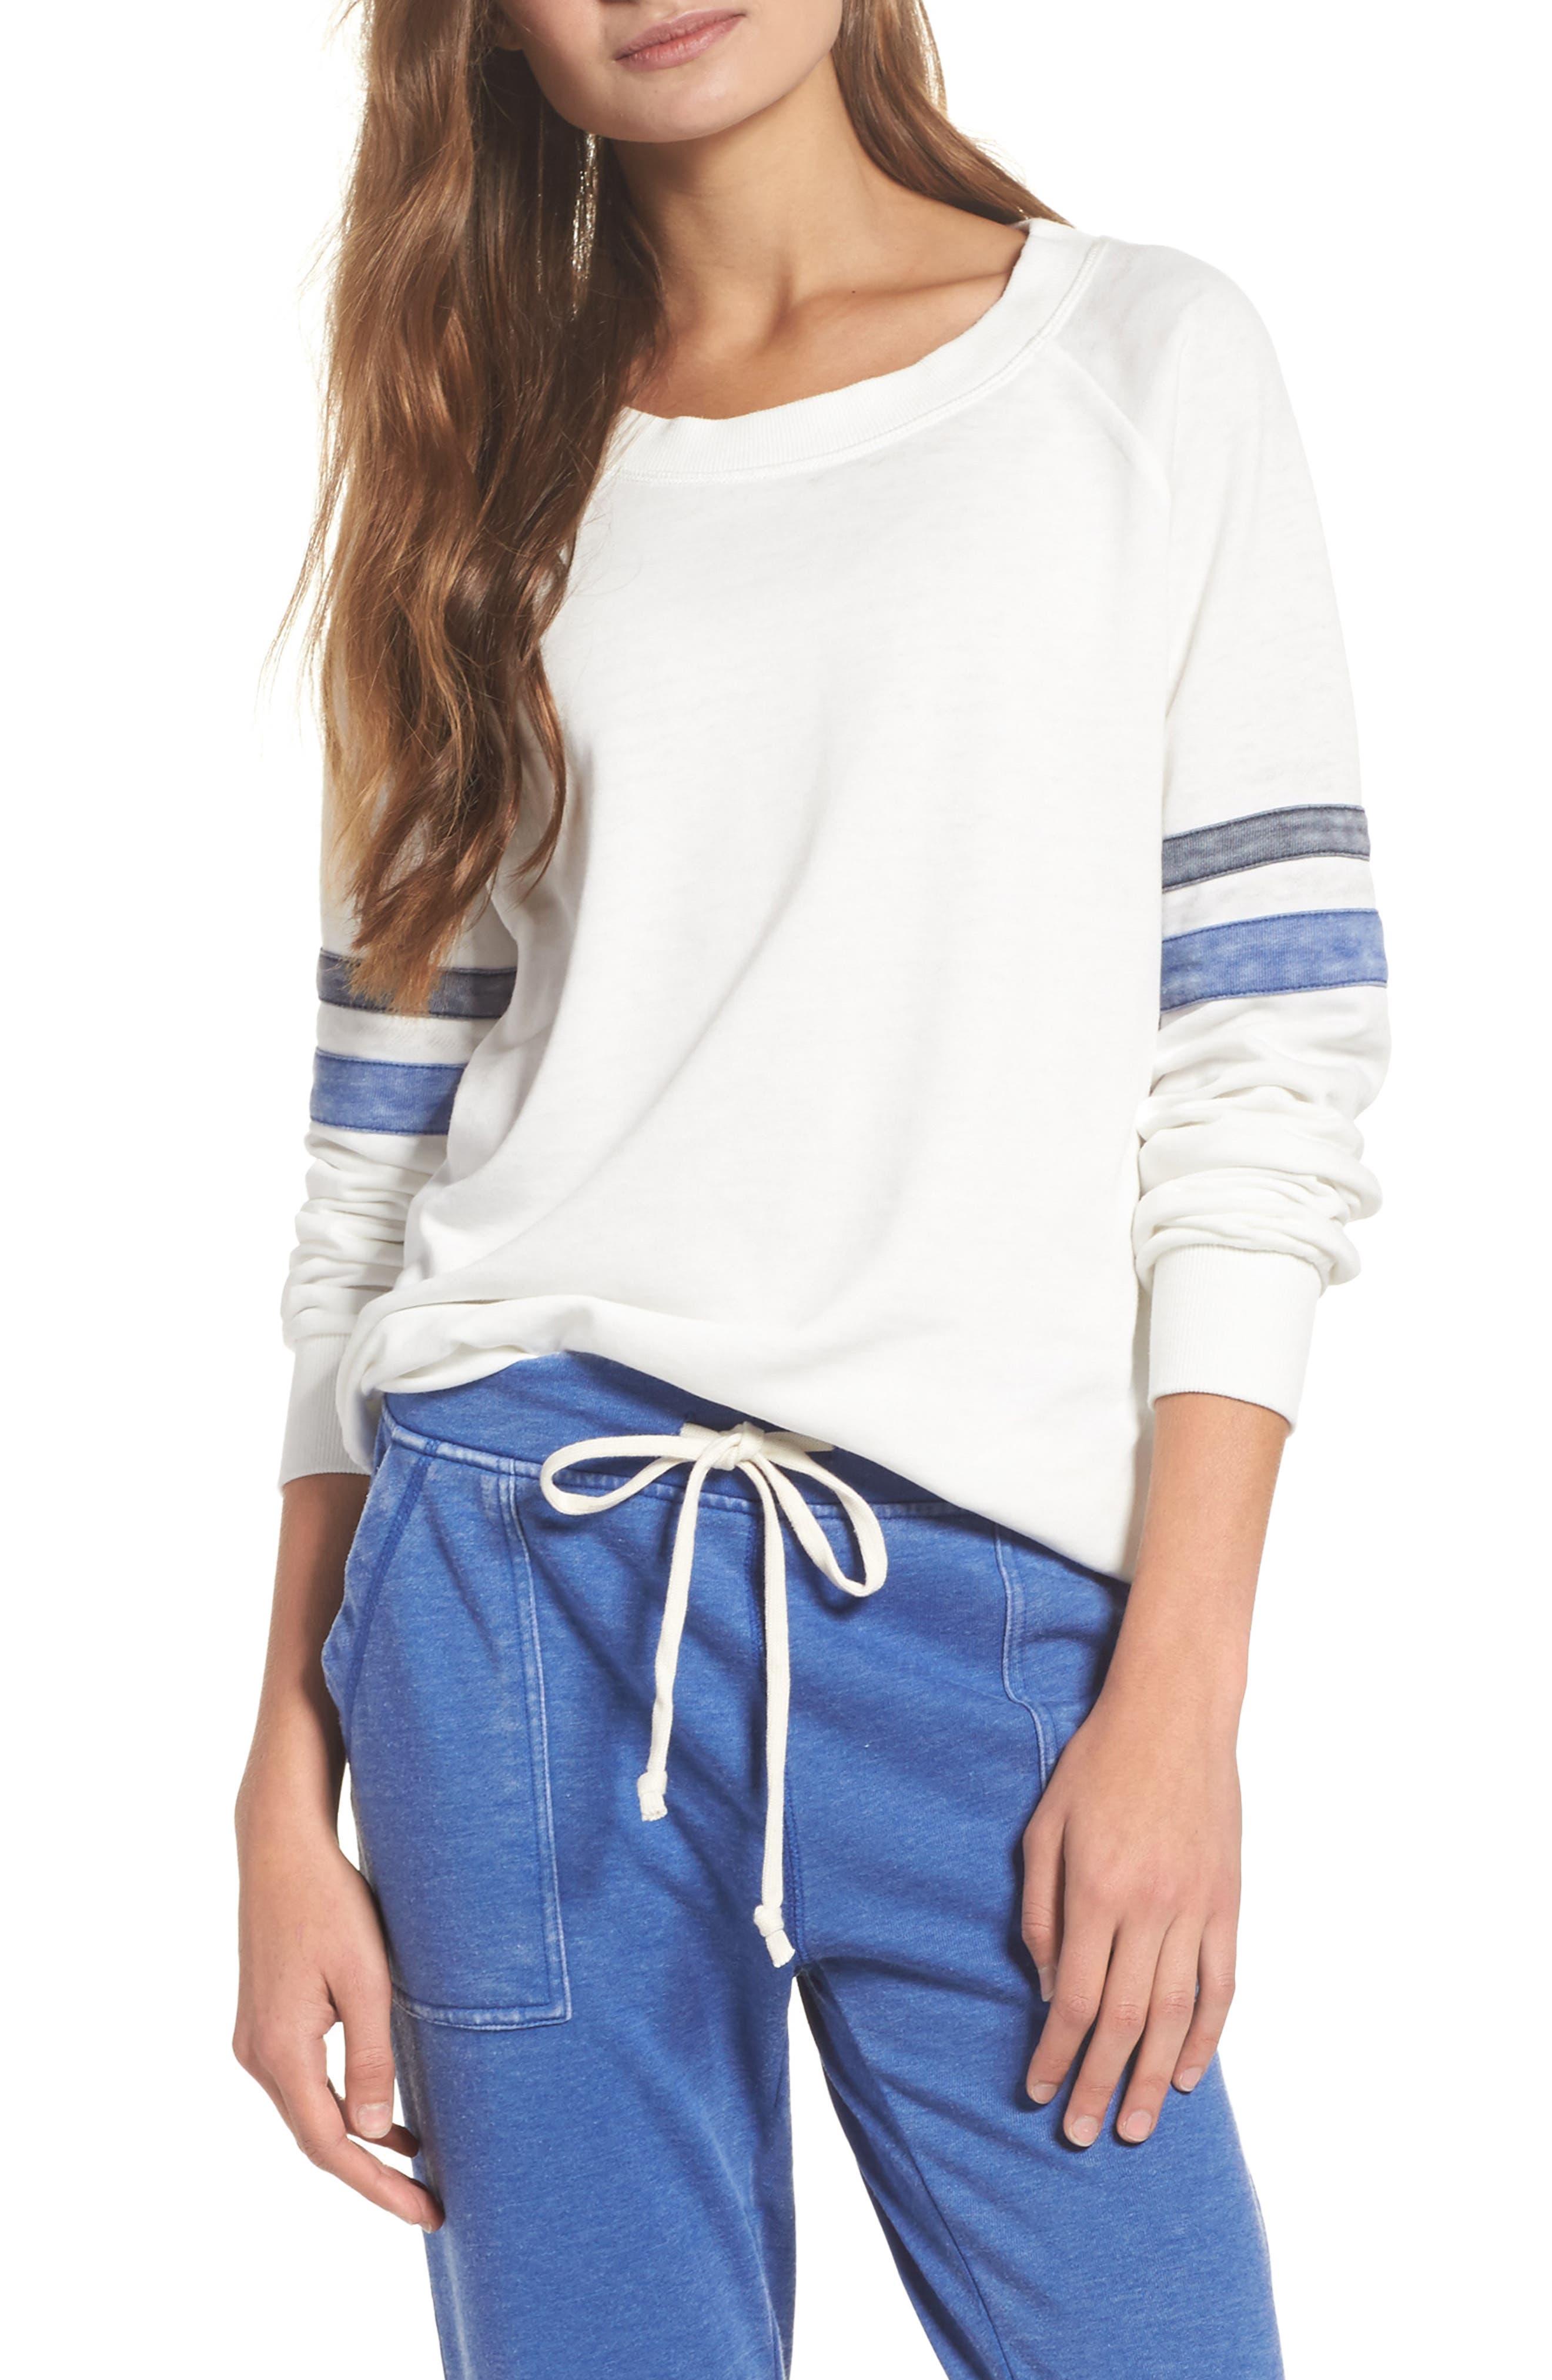 Lazy Day Sweatshirt,                             Main thumbnail 1, color,                             Ivory/ Dark Navy/ Pacific Blue